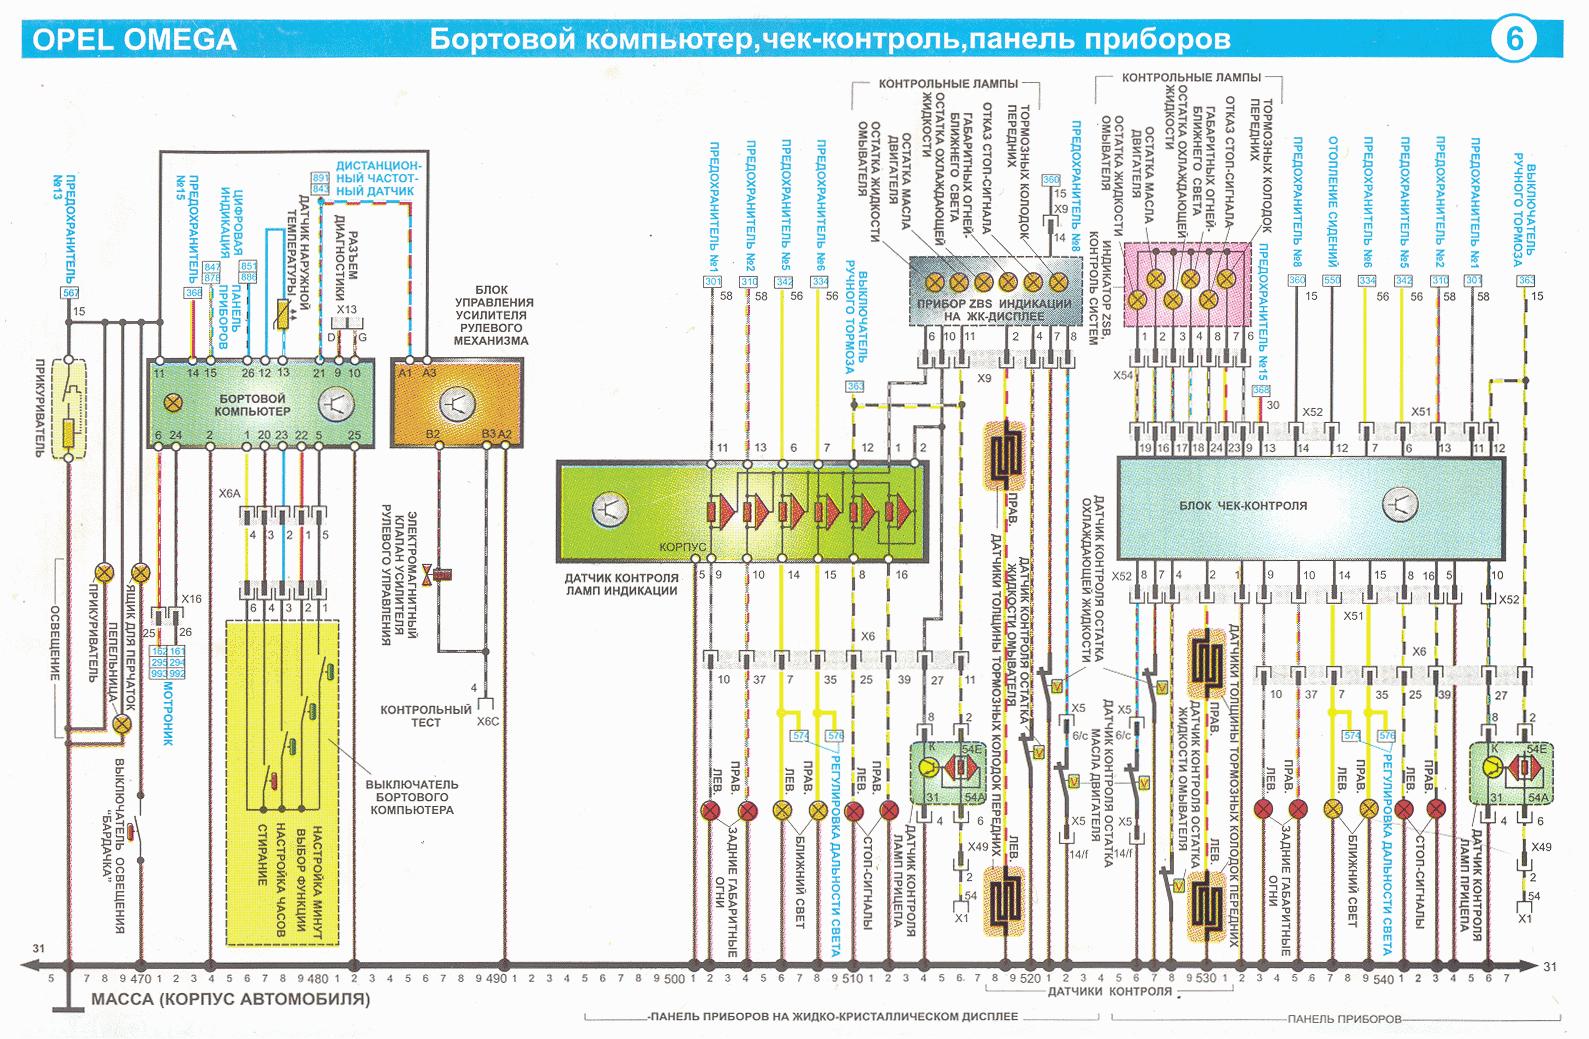 Опель вектра б схема электропроводки климат контроля